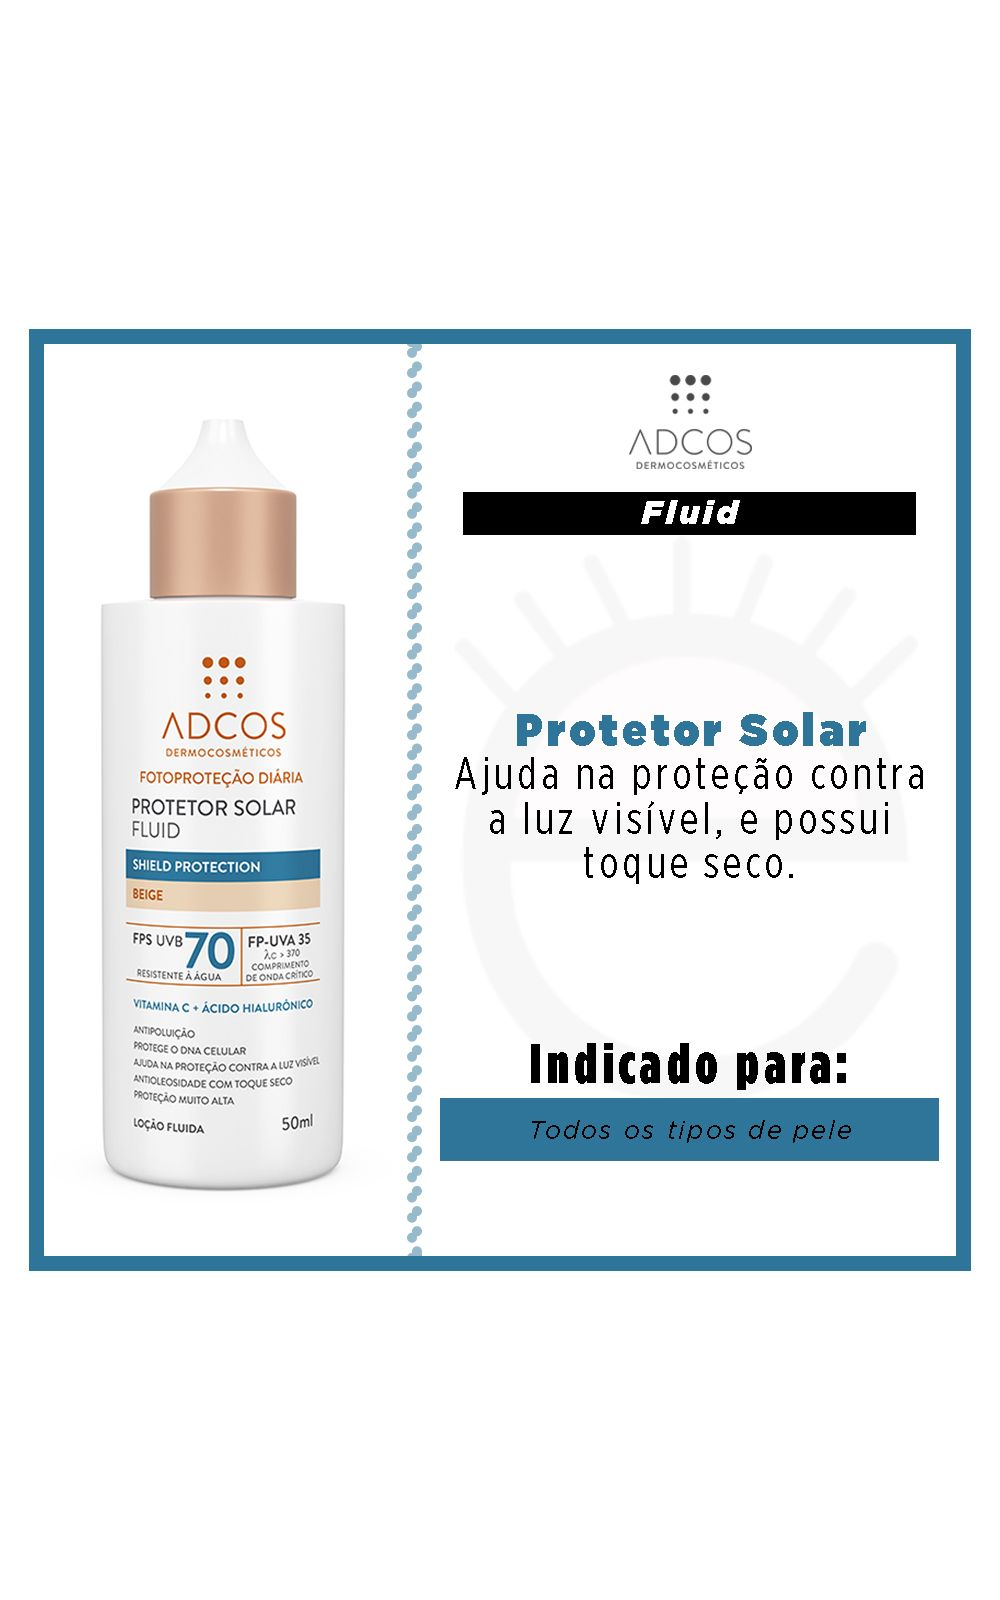 Foto 2 - Protetor Solar Adcos Fluid Shield Protection - Beige